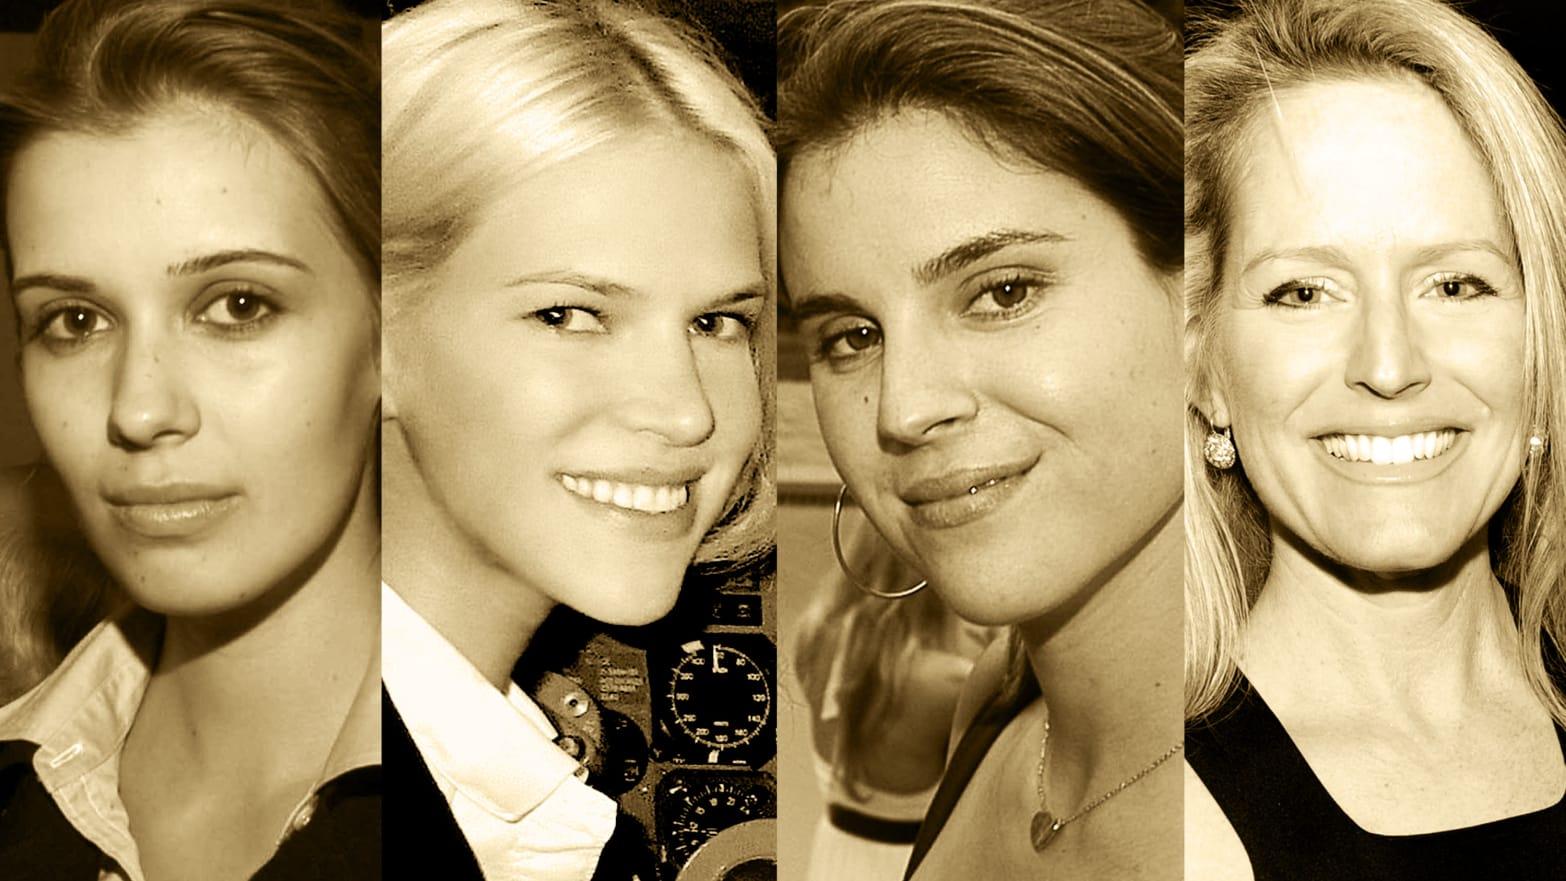 Jeffrey Epstein's Alleged Accomplices: Where Are Sarah Kellen, Nadia Marcinkova, Adriana Ross & Lesley Groff?